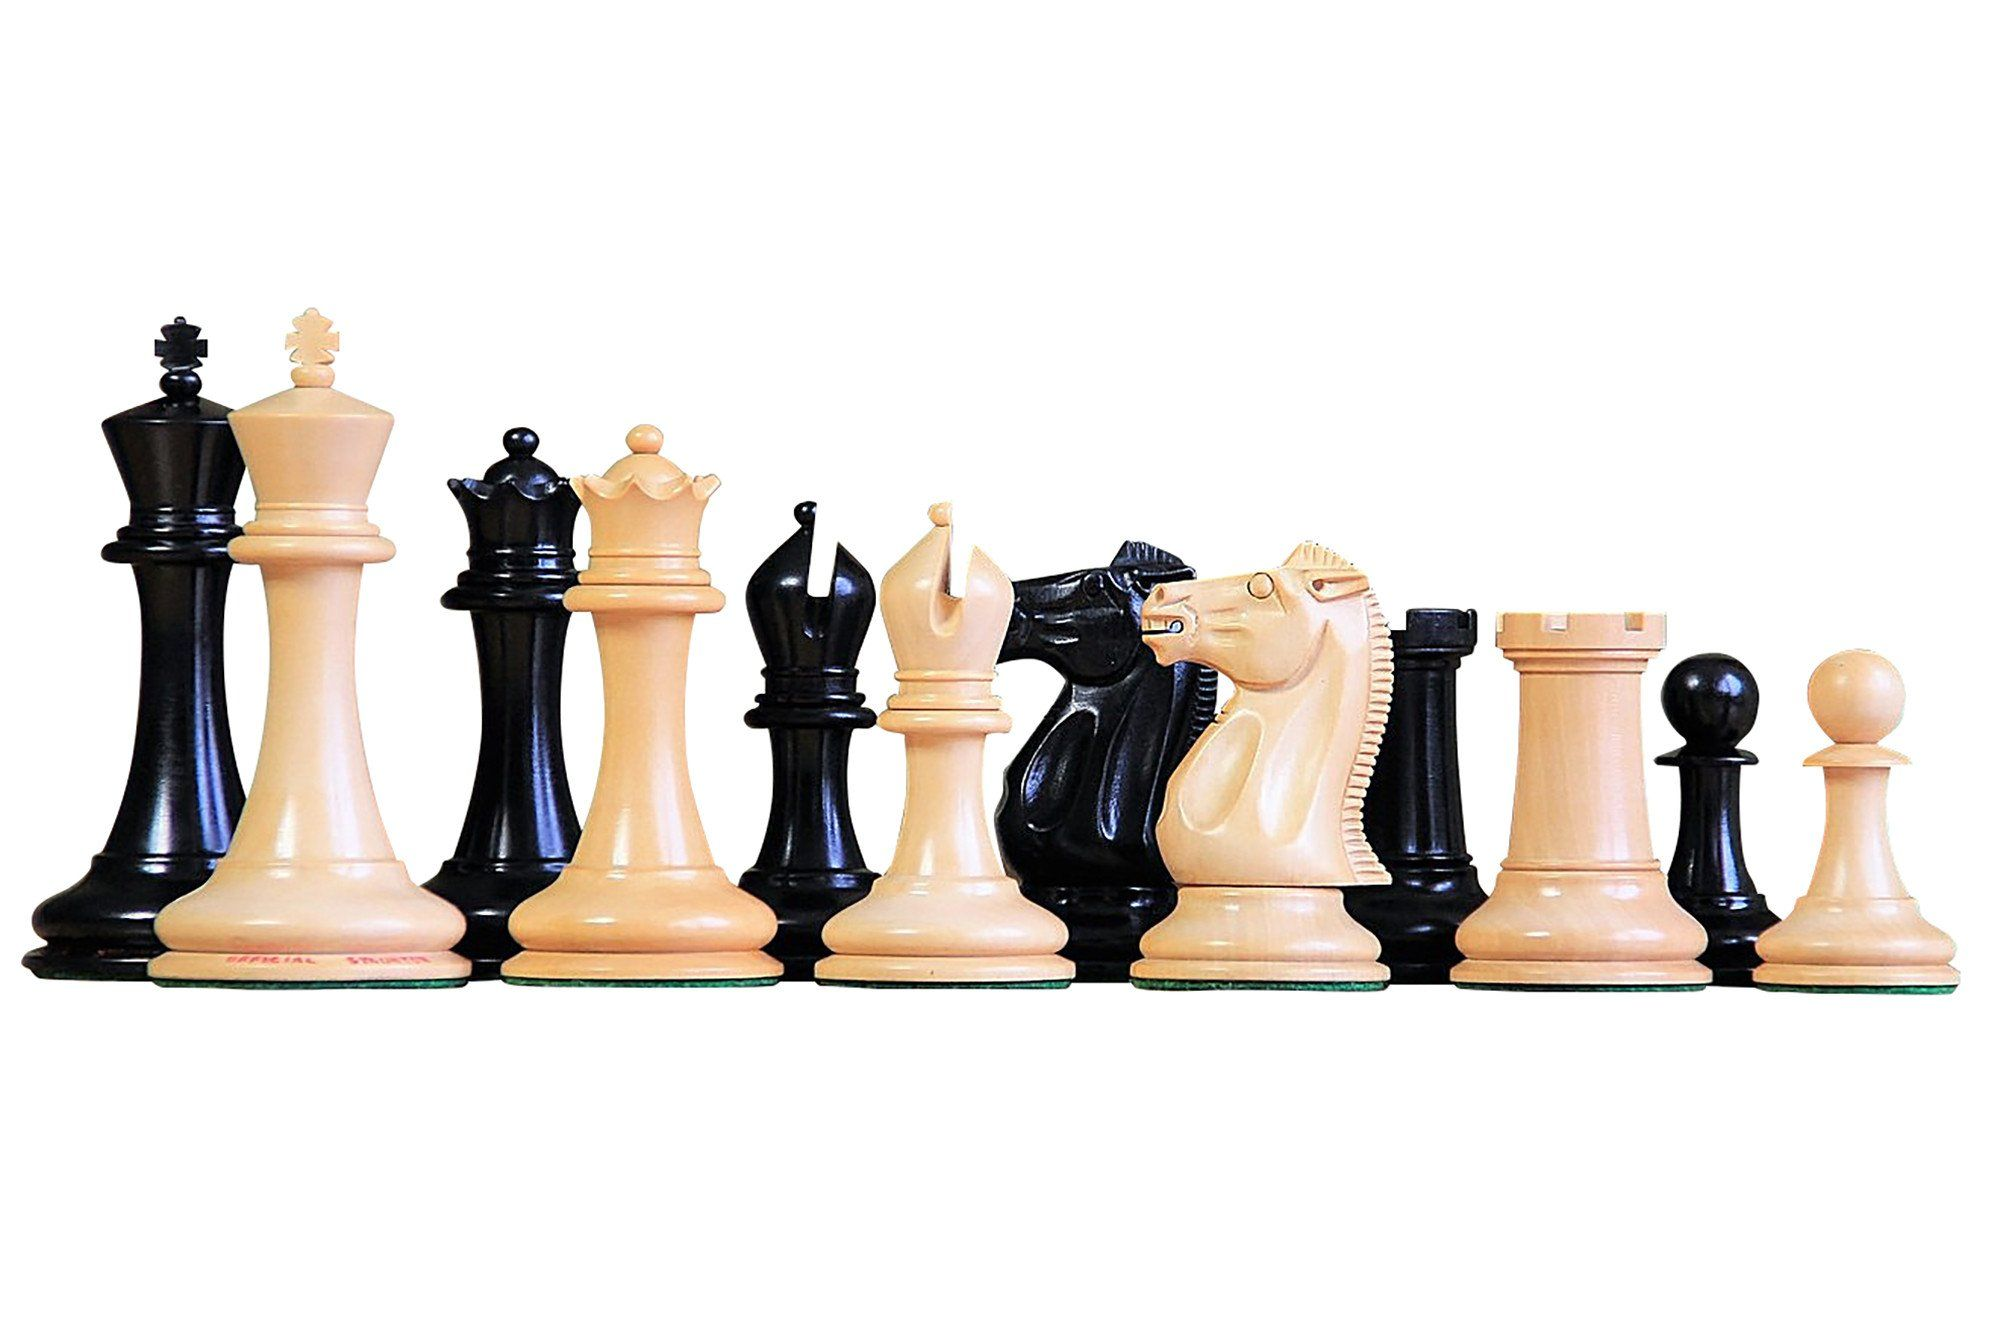 best chess set design ever chess forums chess com